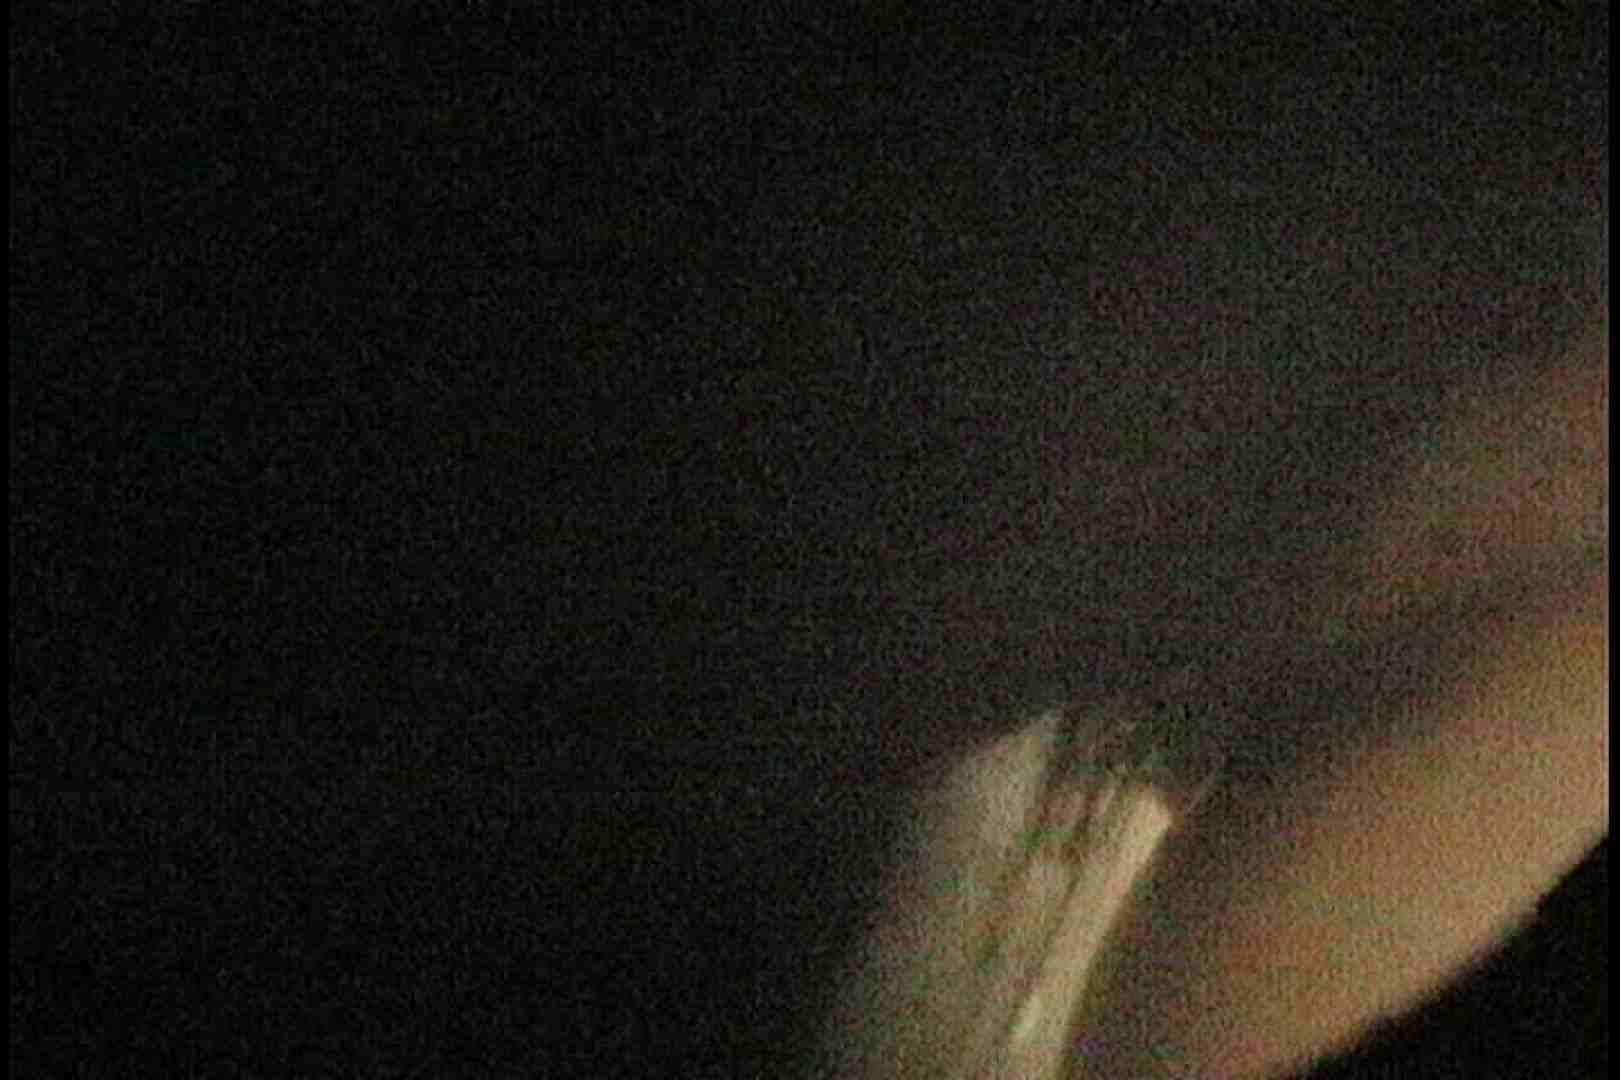 No.15 ワレメ発見!手入れをしてない眉毛が年齢を物語ります。 貧乳 オマンコ無修正動画無料 99画像 29